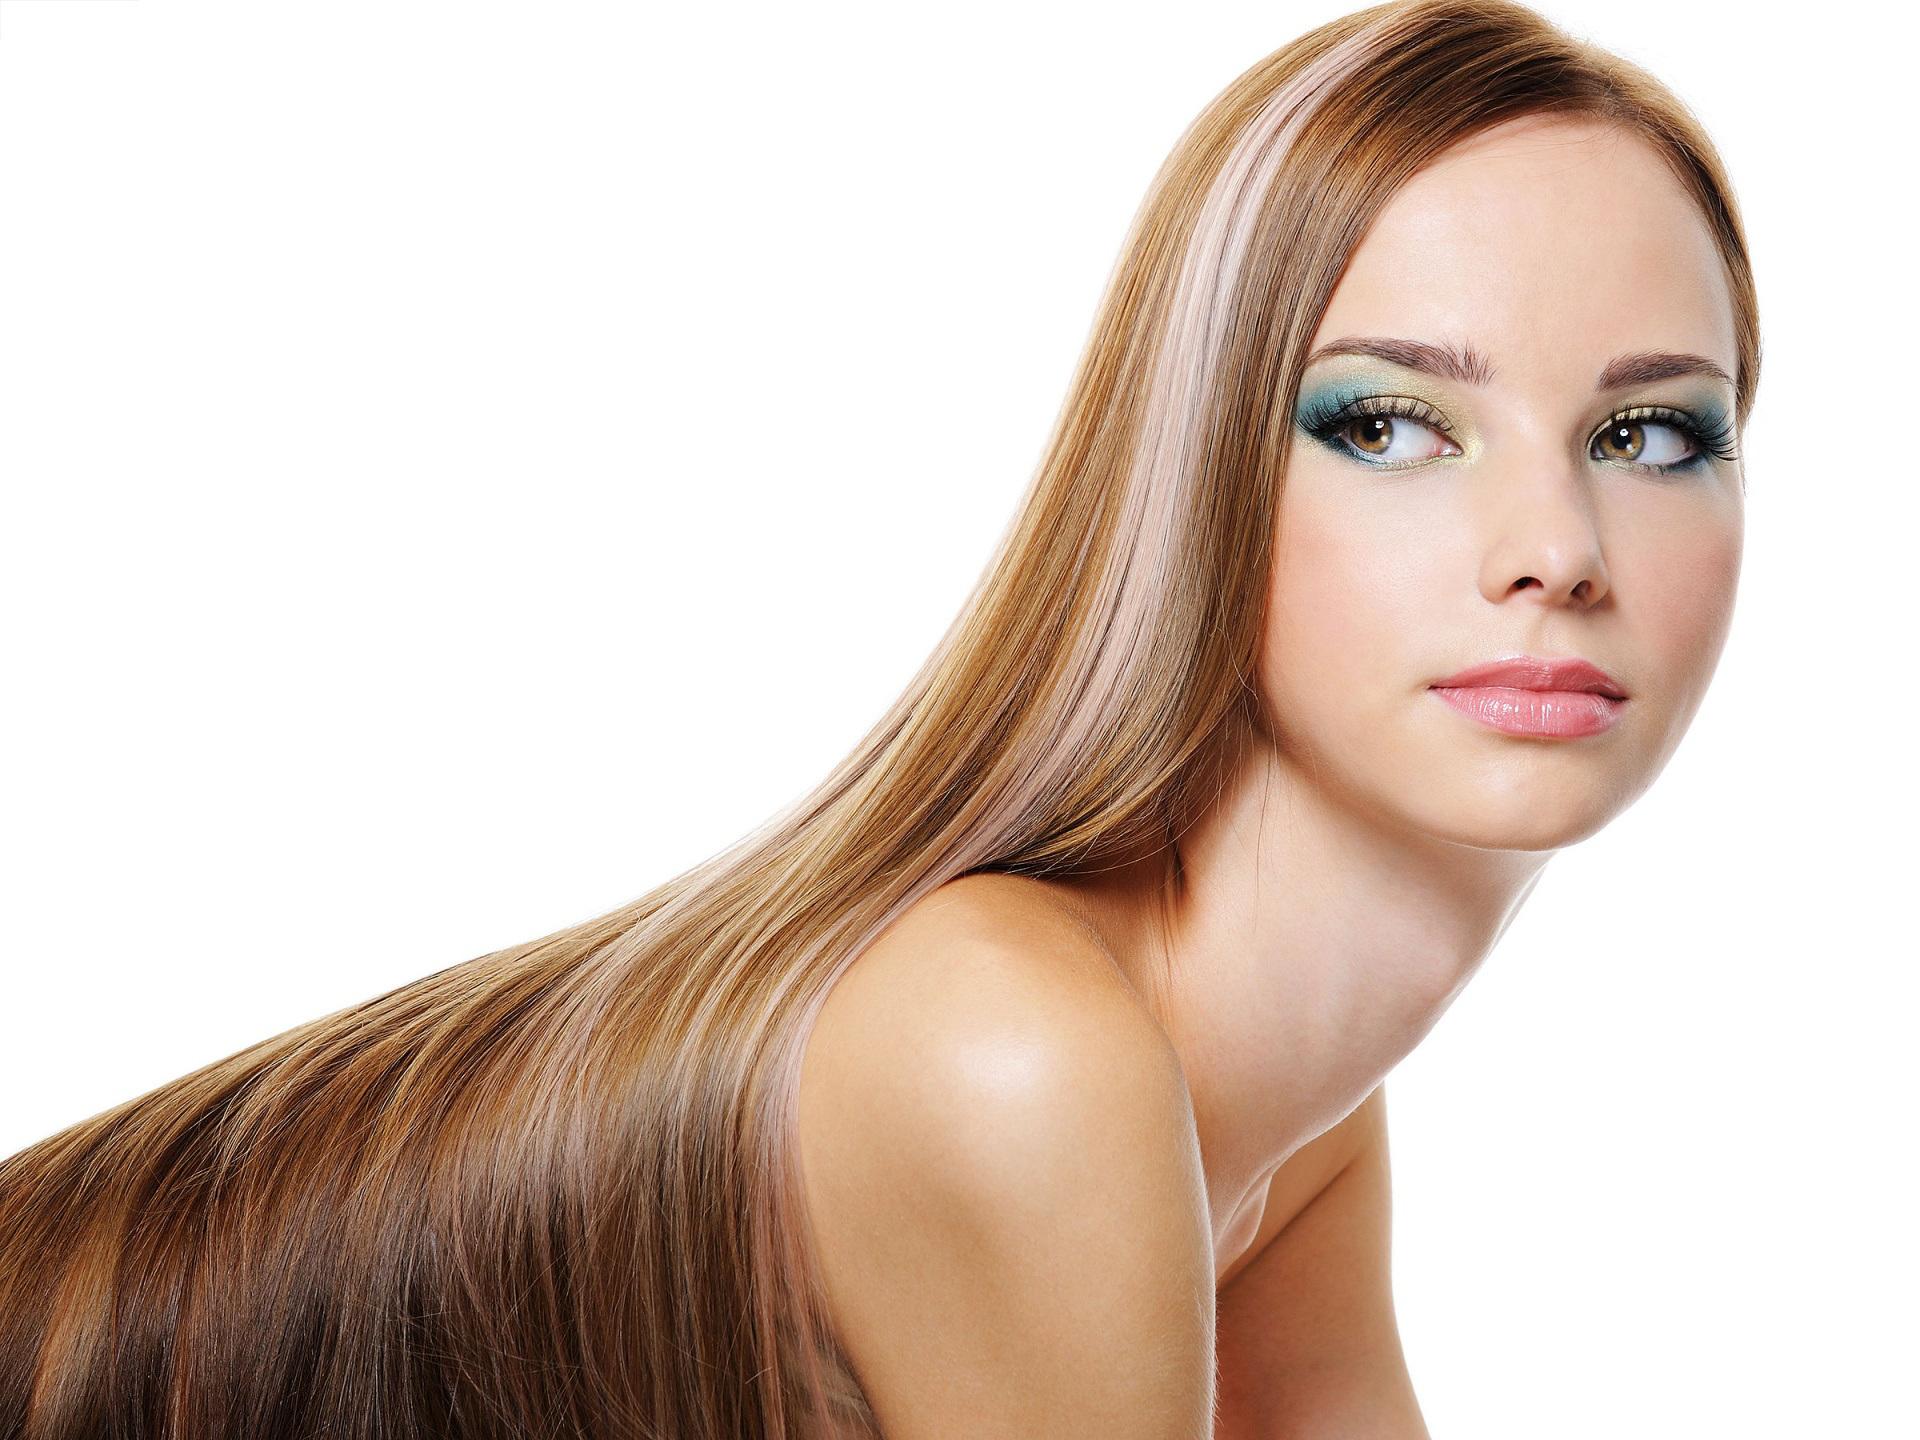 Tagliare i capelli da asciutti rovina